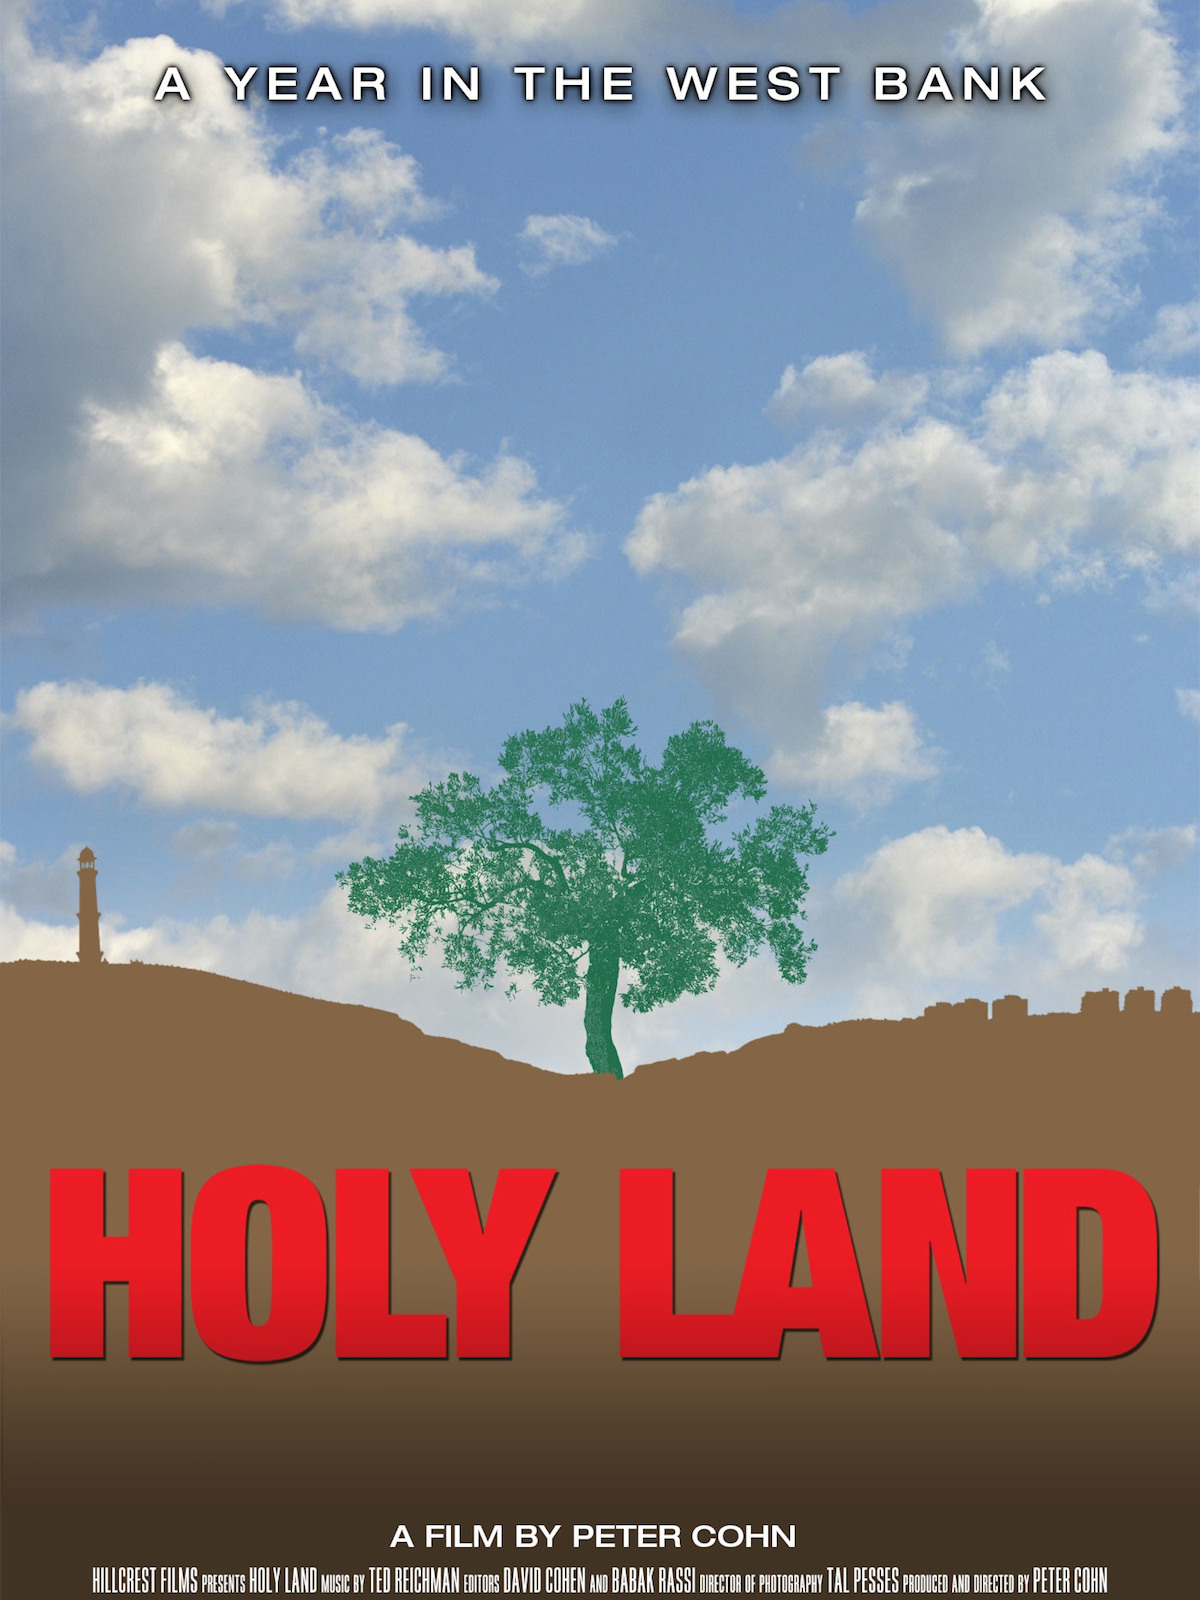 HolyLand_3x4_3